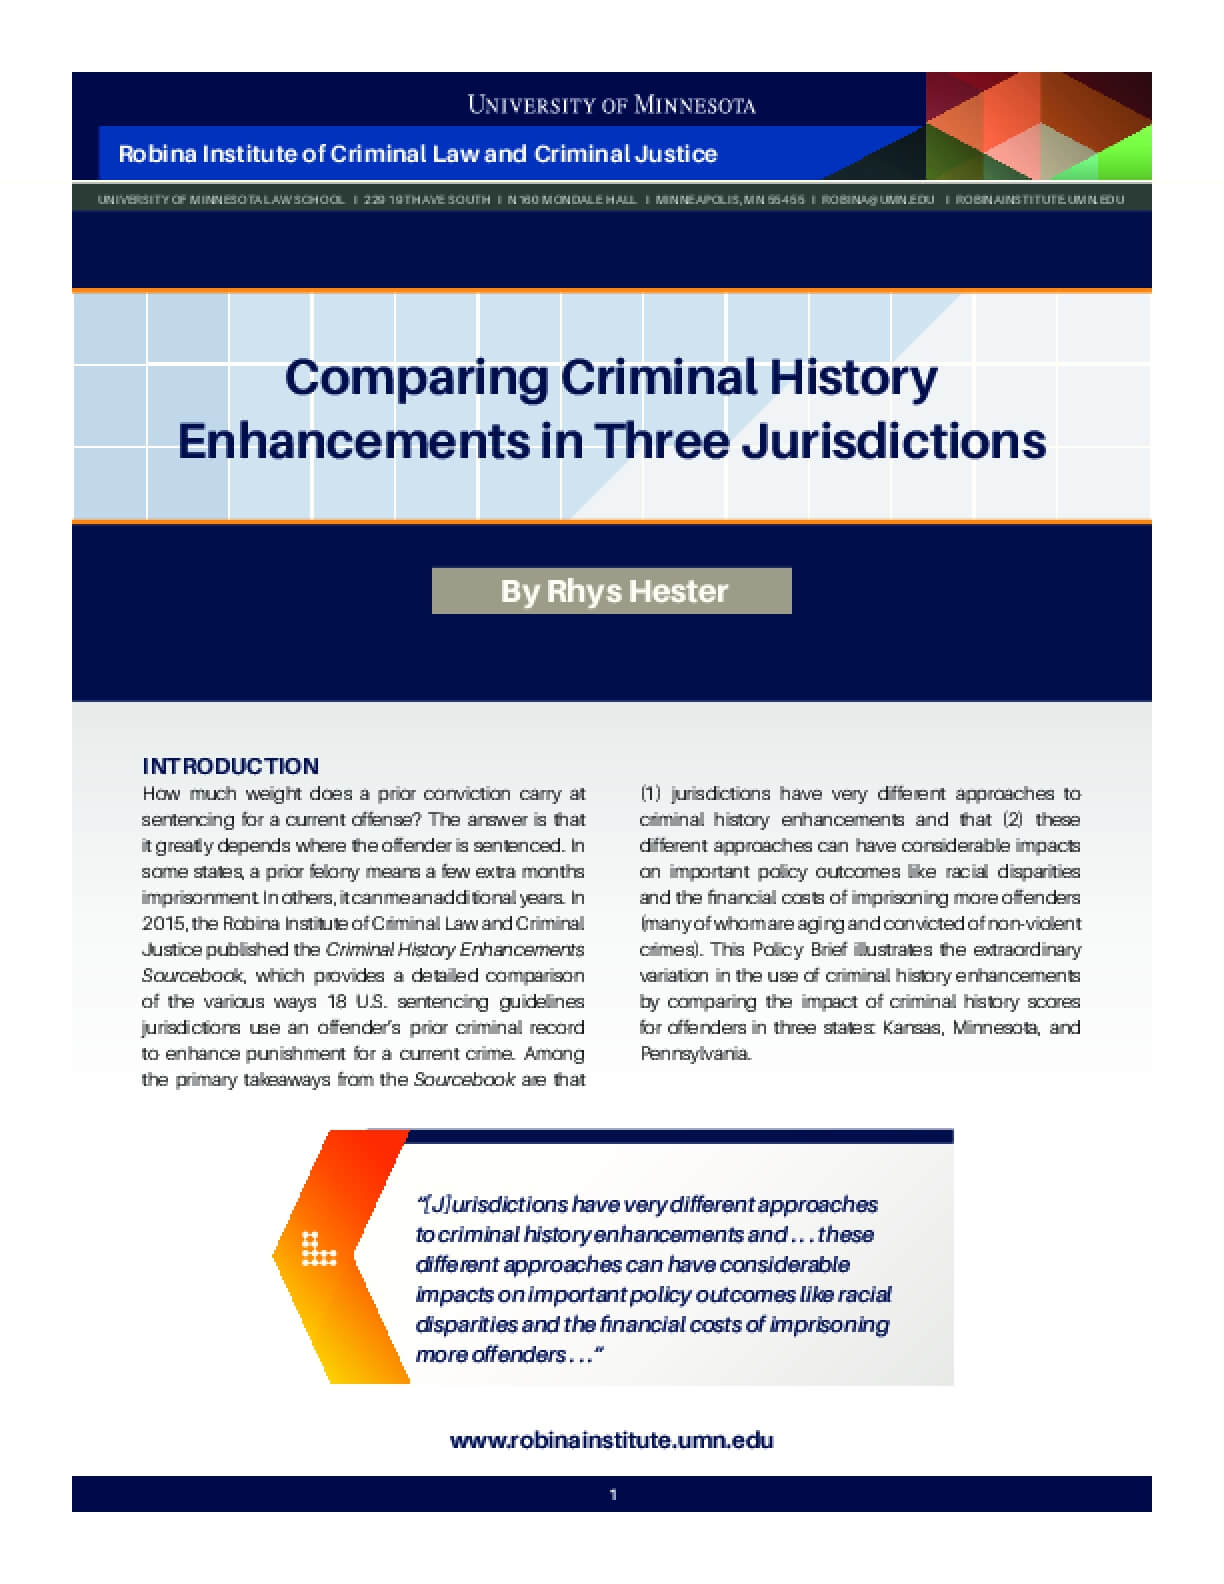 Comparing Criminal History Enhancements in Three Jurisdictions